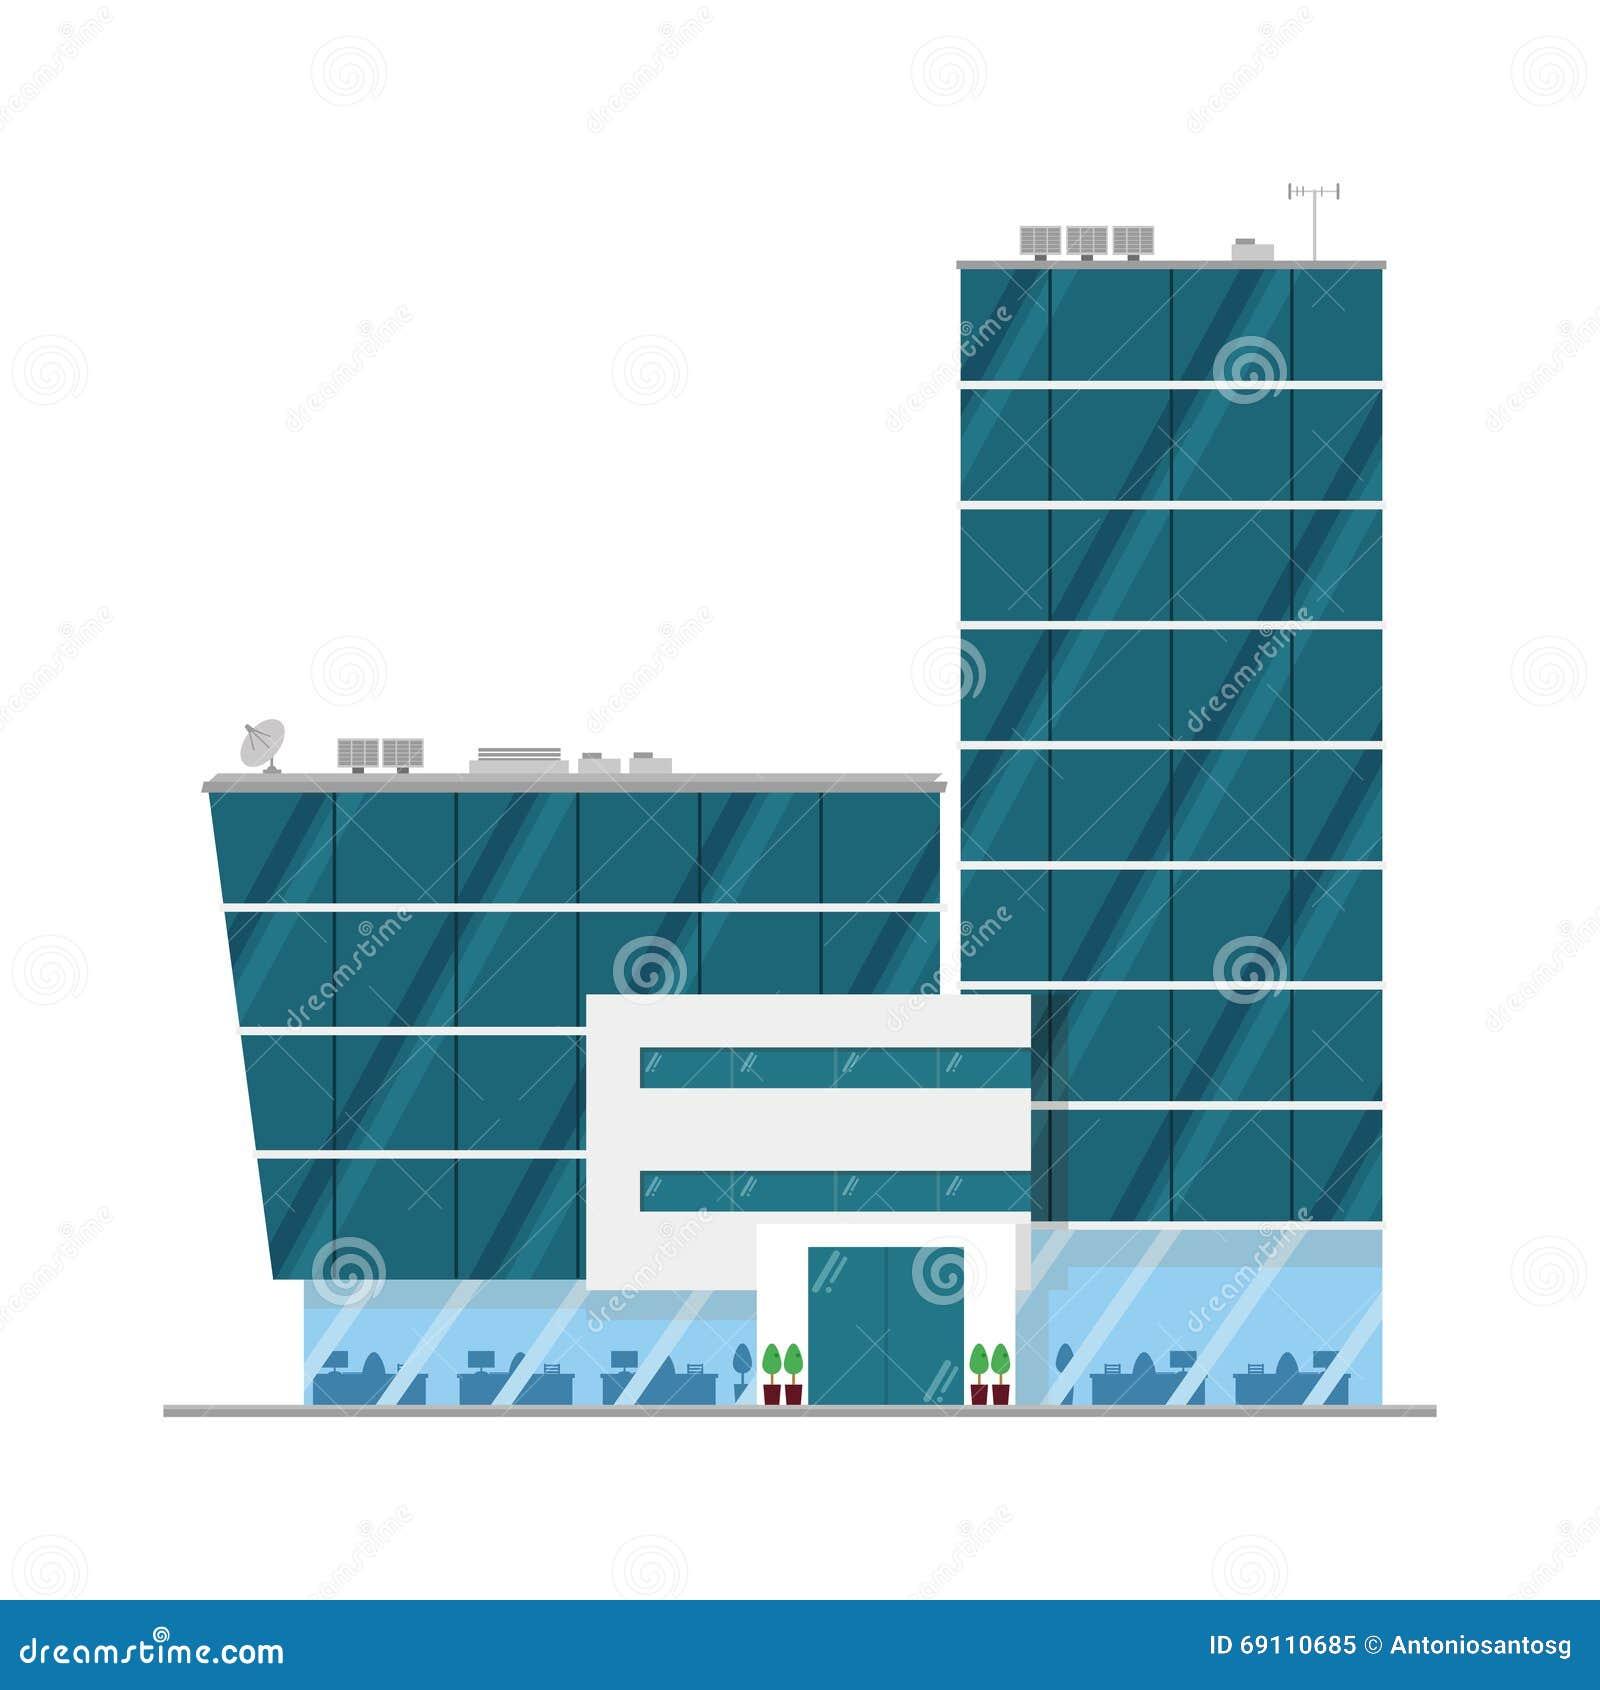 Cute Cartoon Vector Illustration Of An Office Building Stock Vector